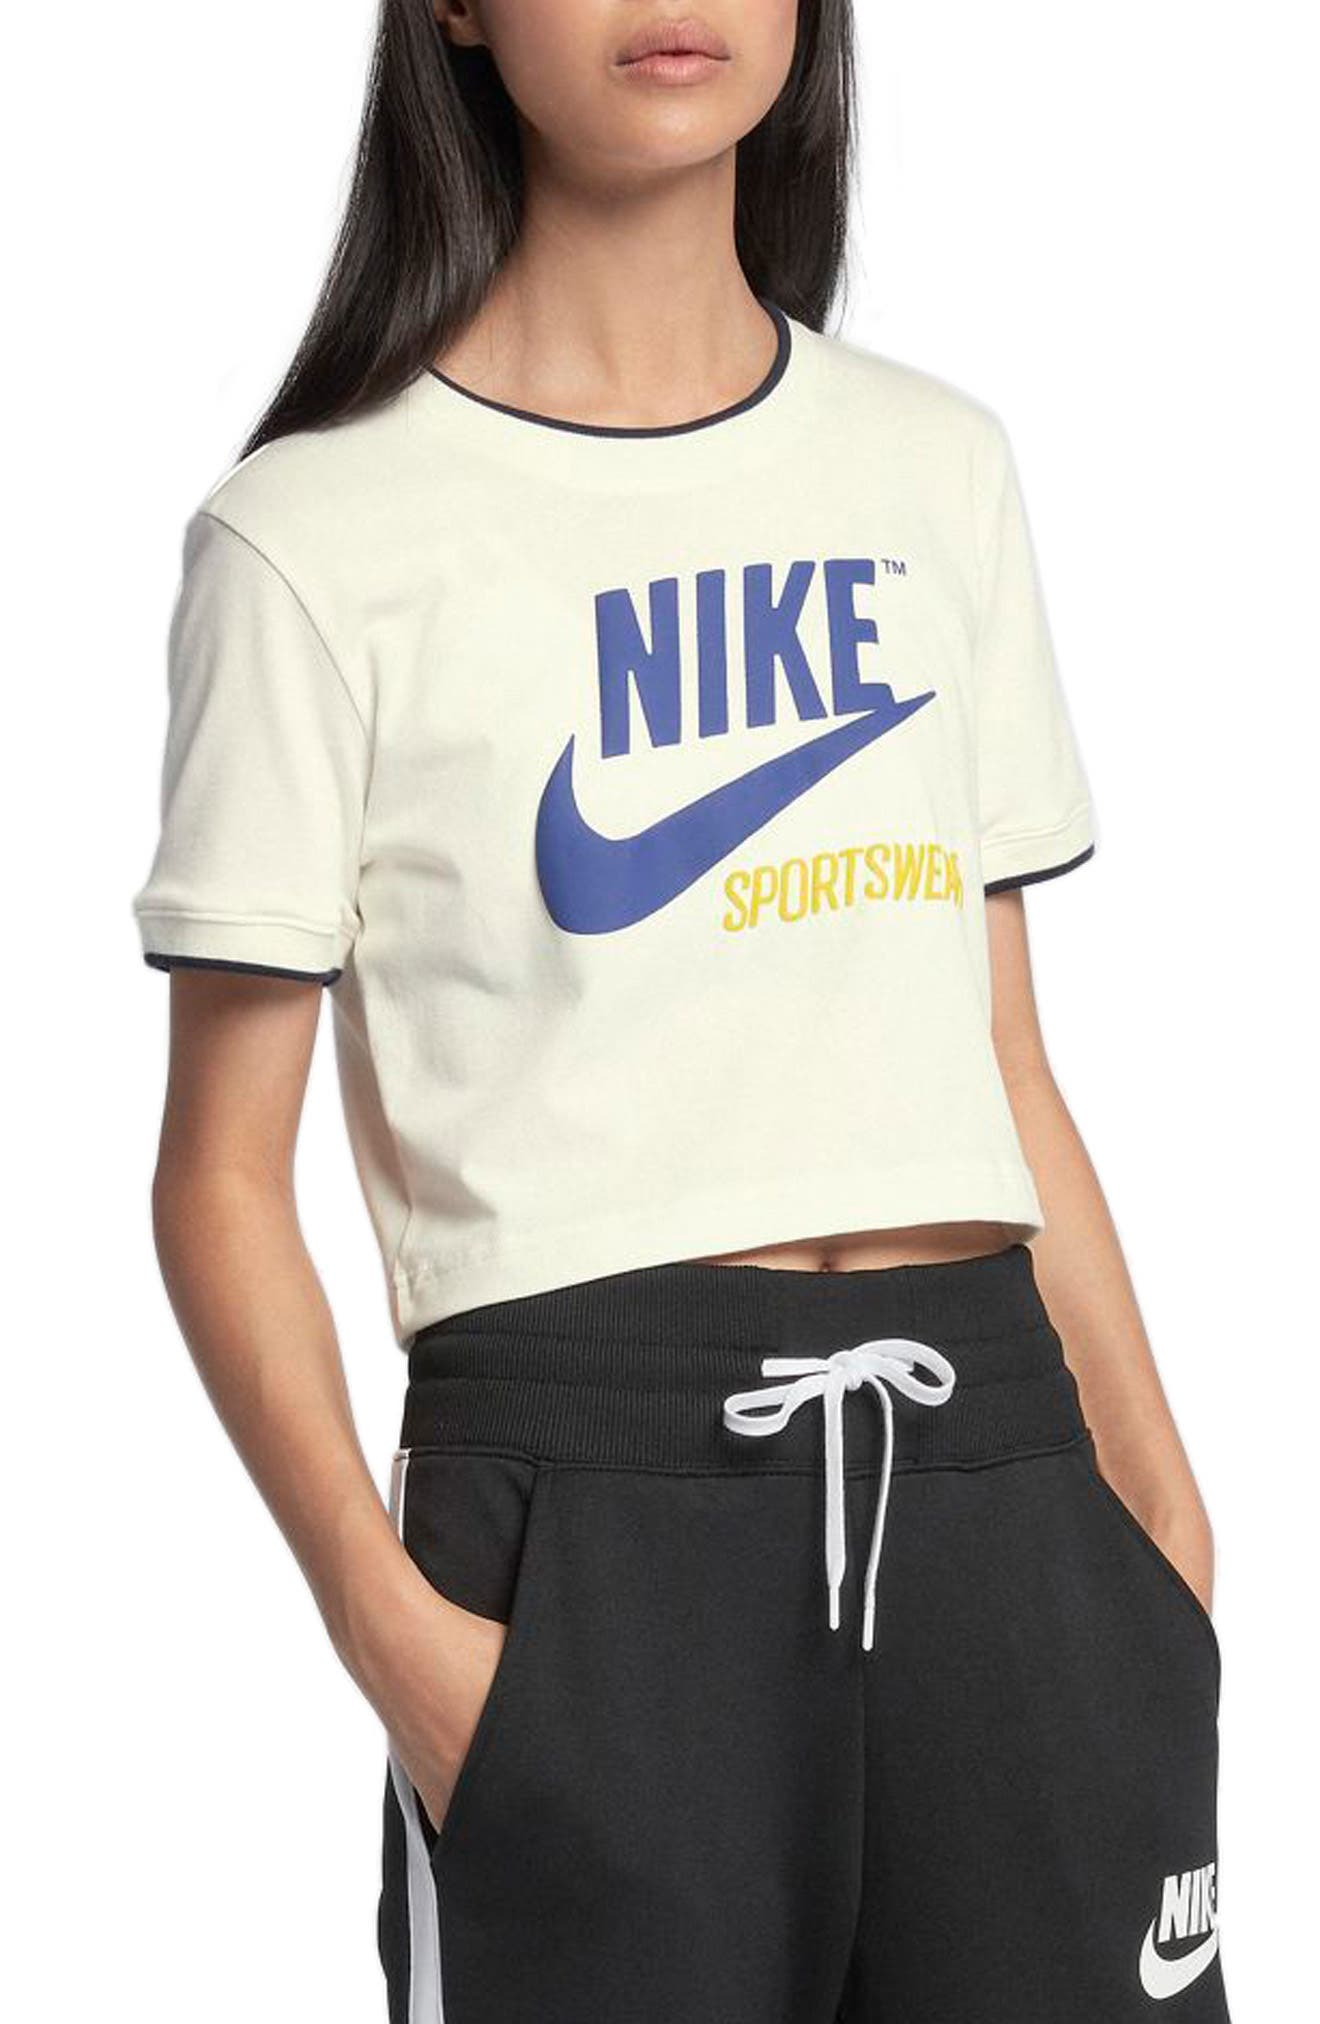 Sportswear Crop Top,                         Main,                         color, Sail